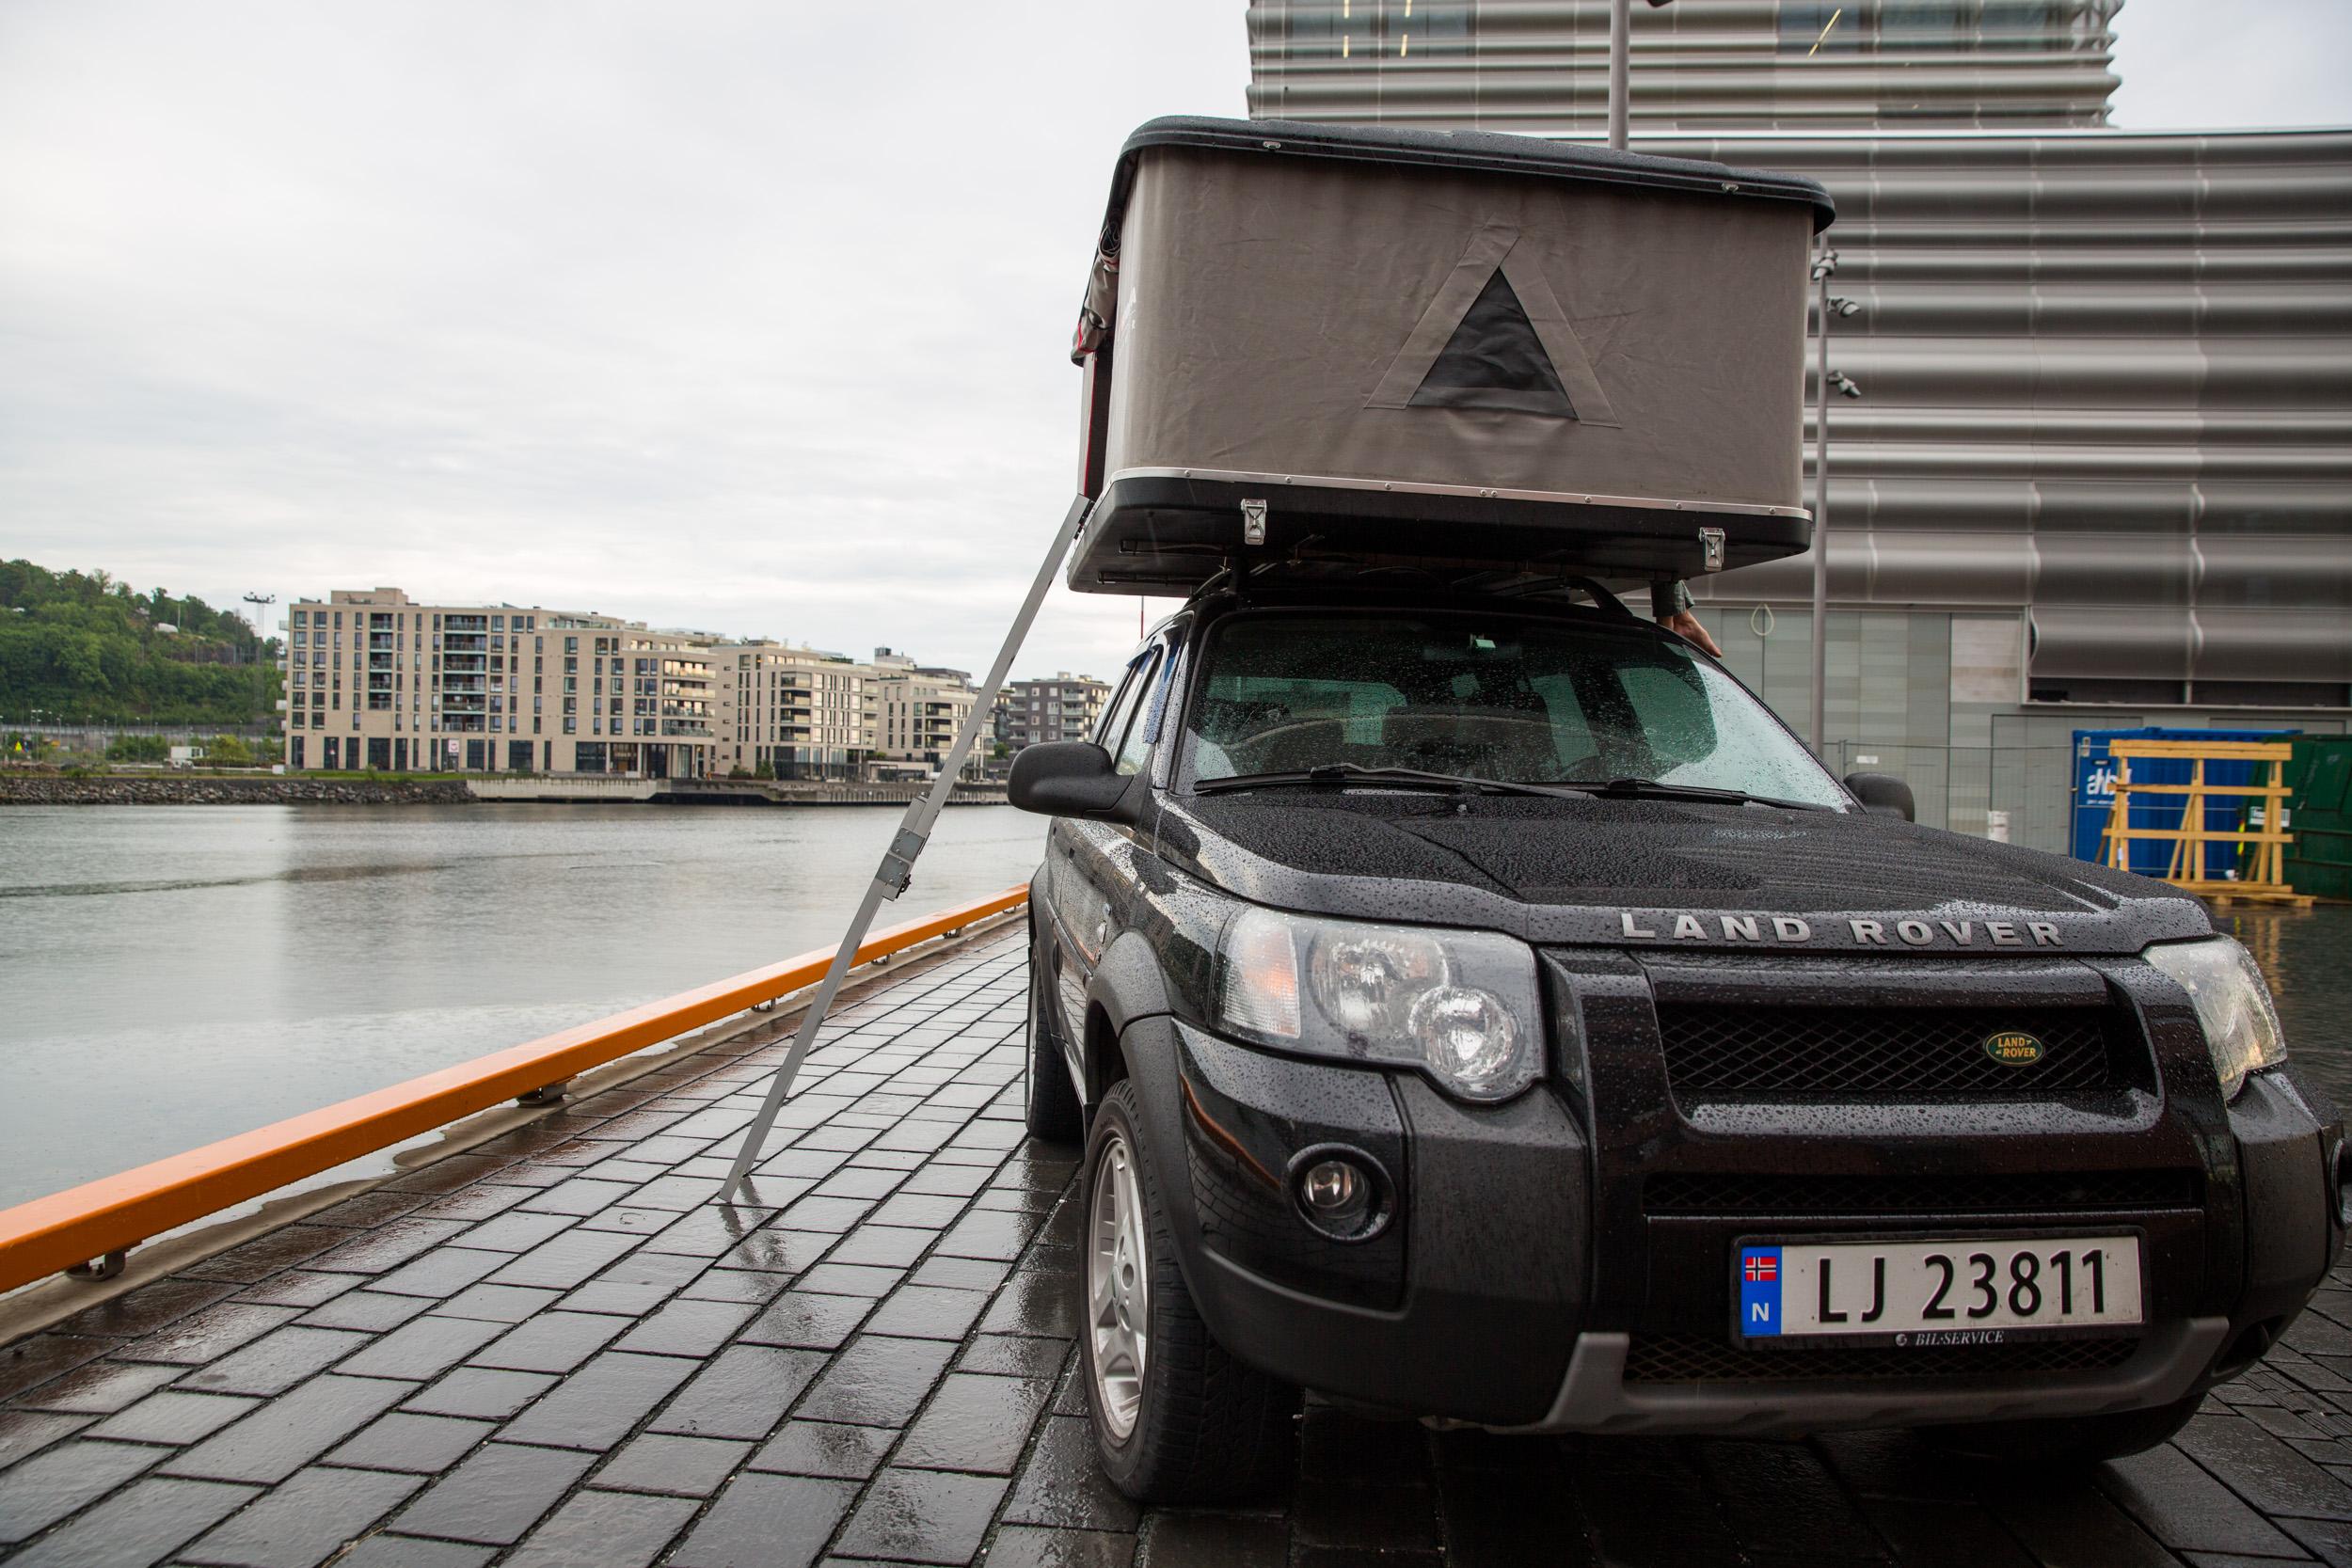 Land Rover Freelander - Isabella - Norwegian Explorer Vans-2